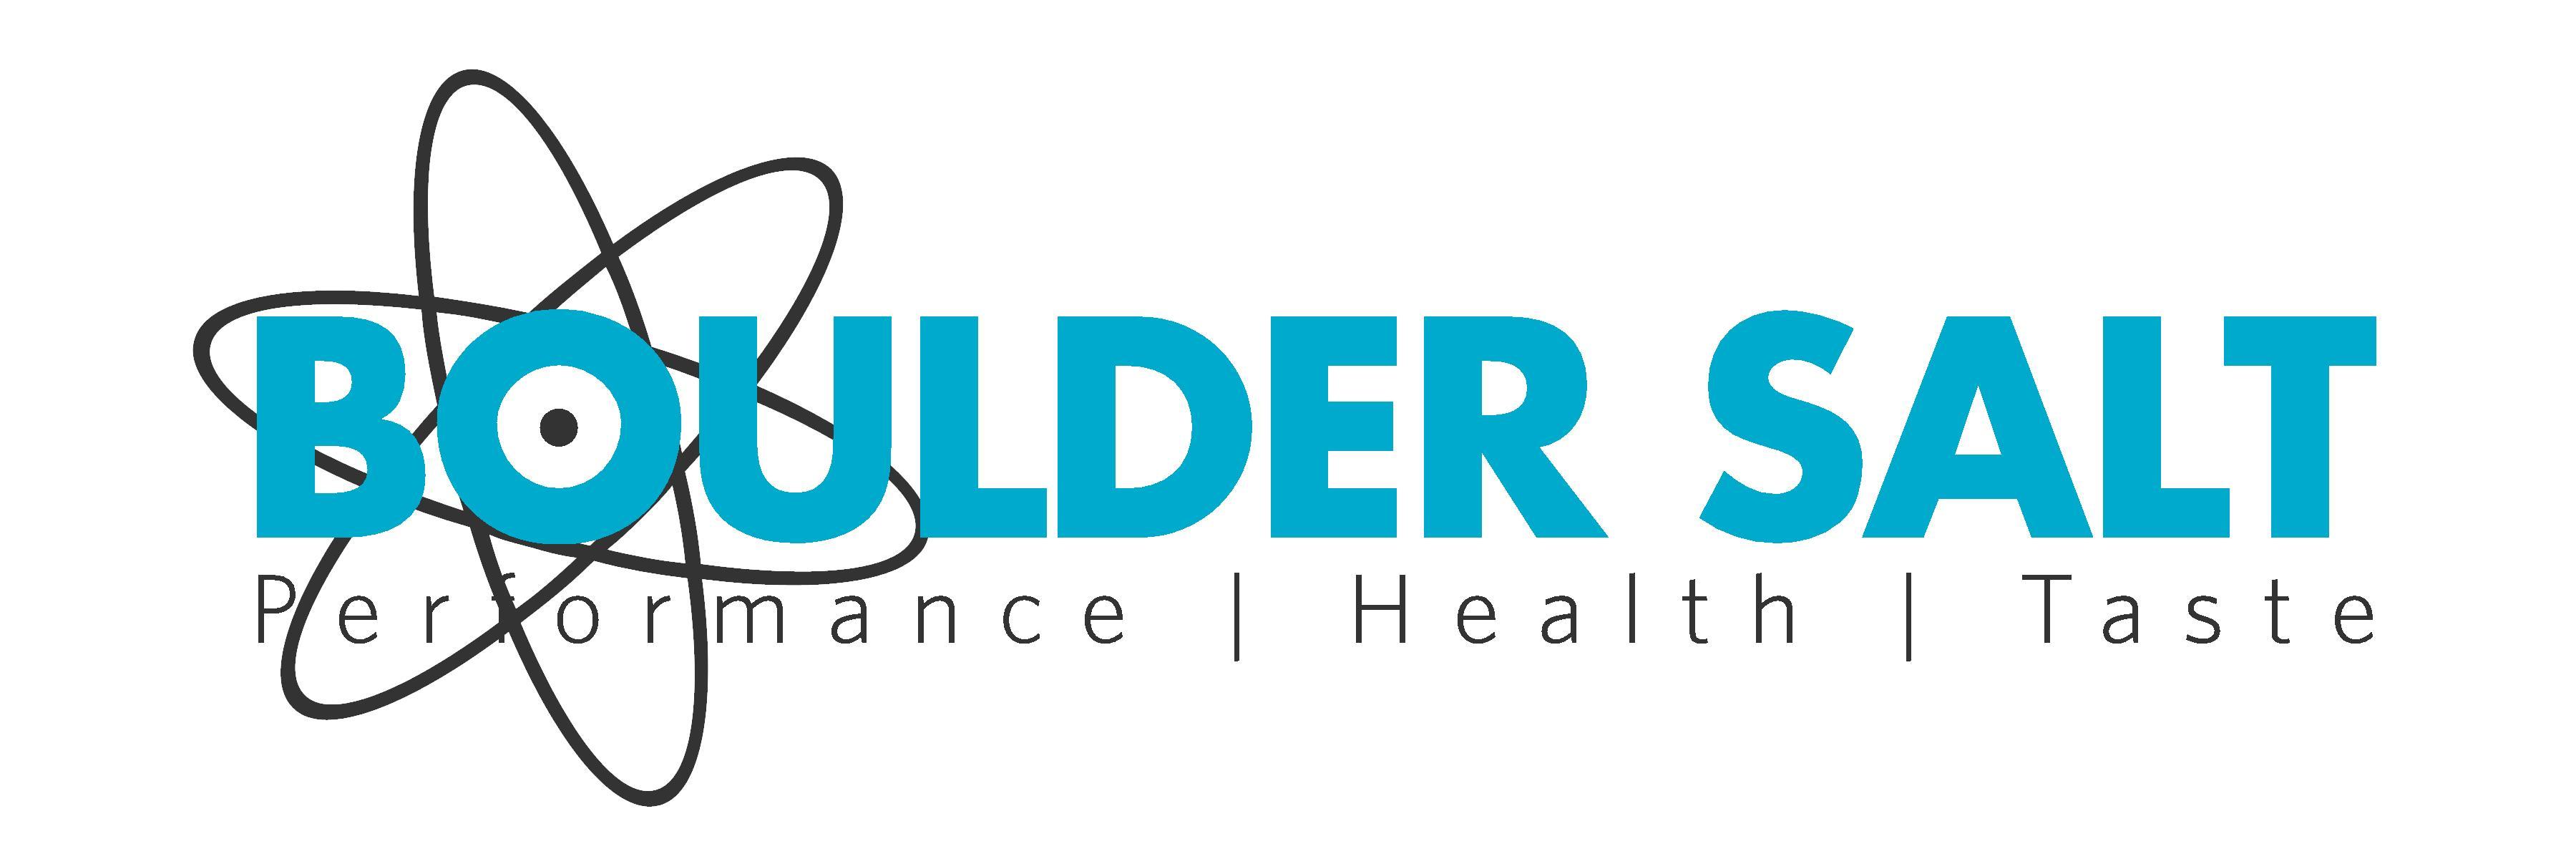 Boulder Salt Company